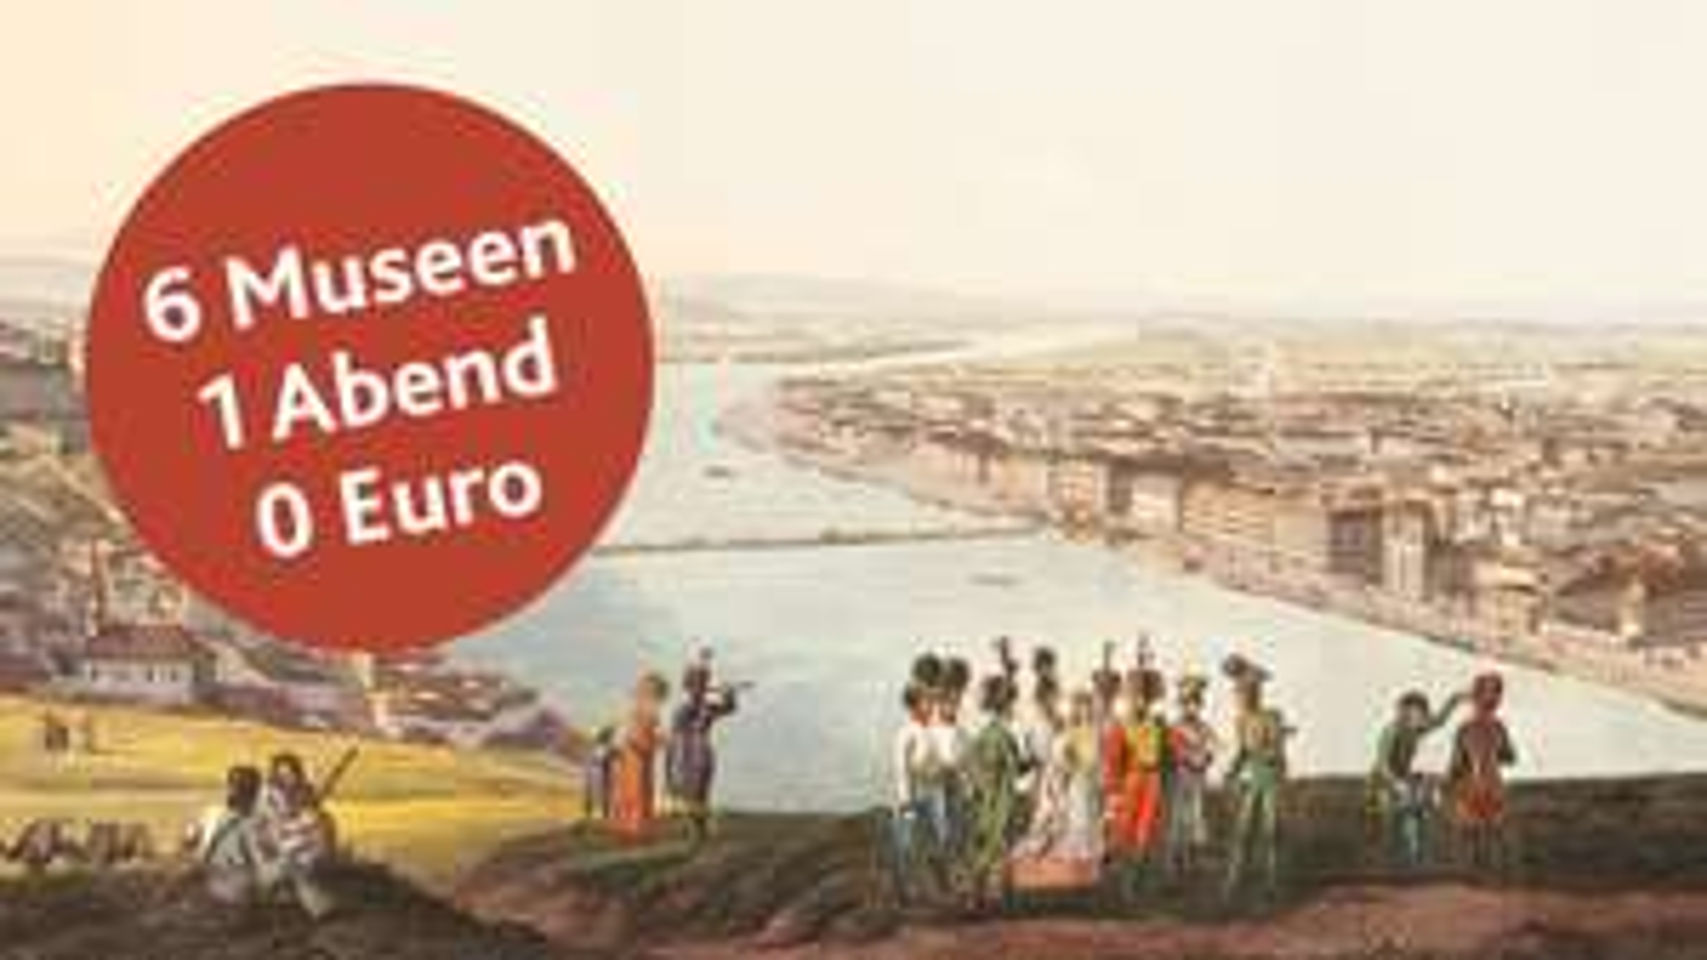 6 Museen - 1 Abend - 0 Euro